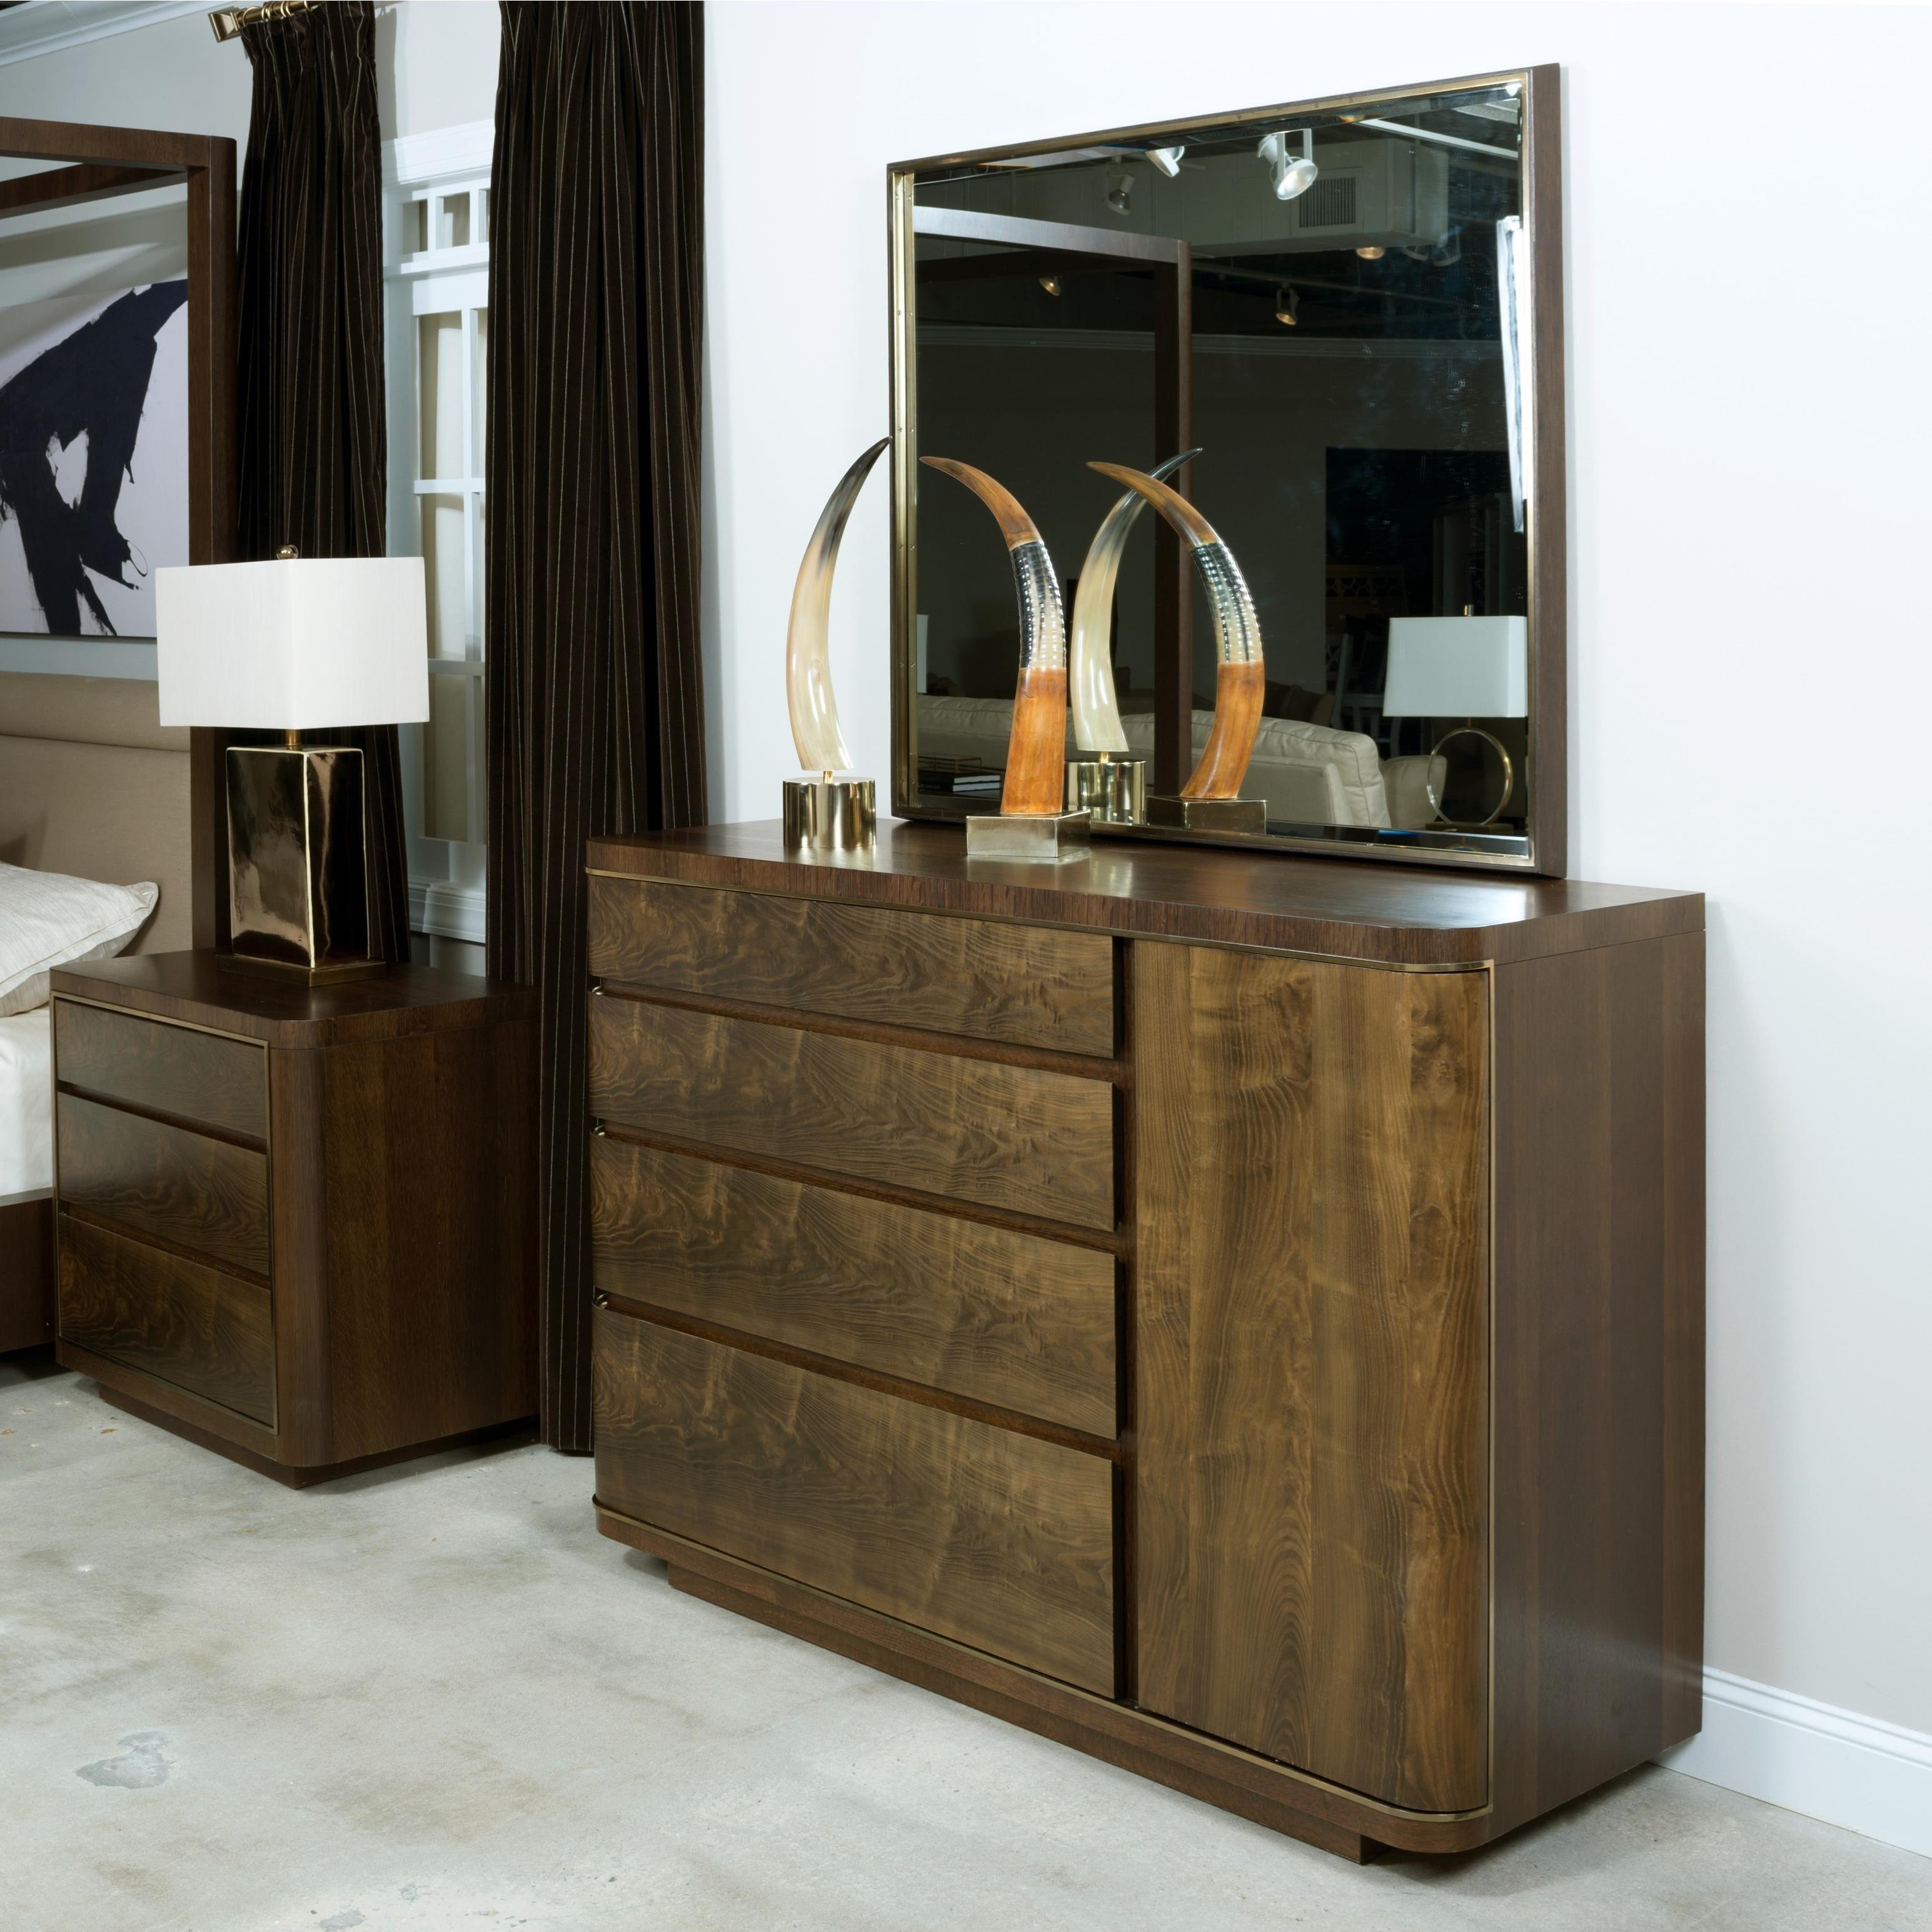 American Drew Ad Modern Organics Spencer Dresser and Holt Mirror - Item Number: 600-030+131